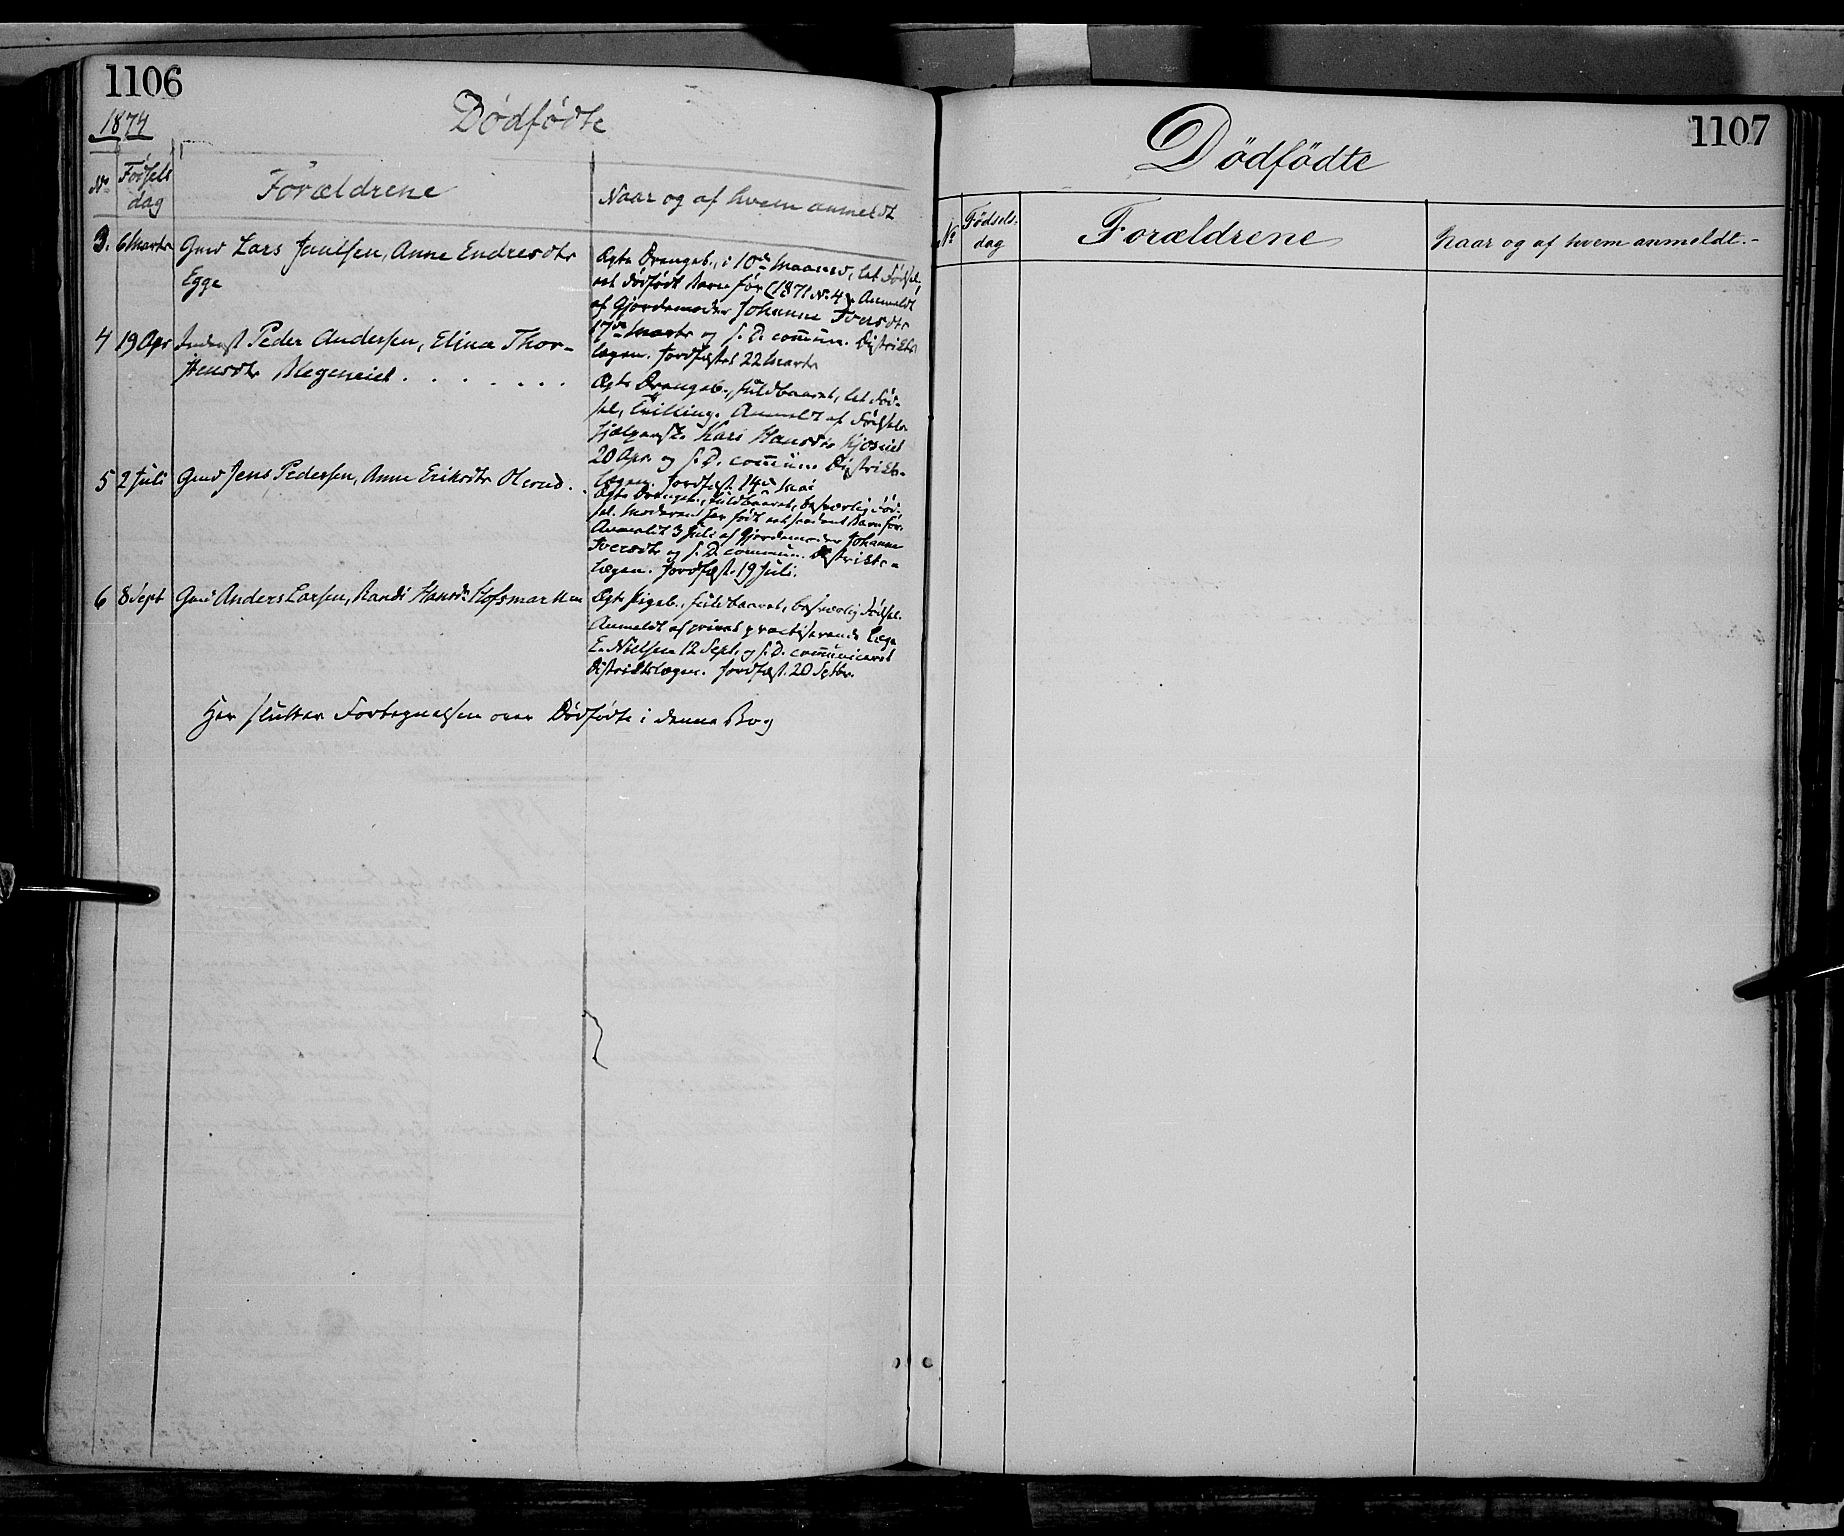 SAH, Gran prestekontor, Ministerialbok nr. 12, 1856-1874, s. 1106-1107